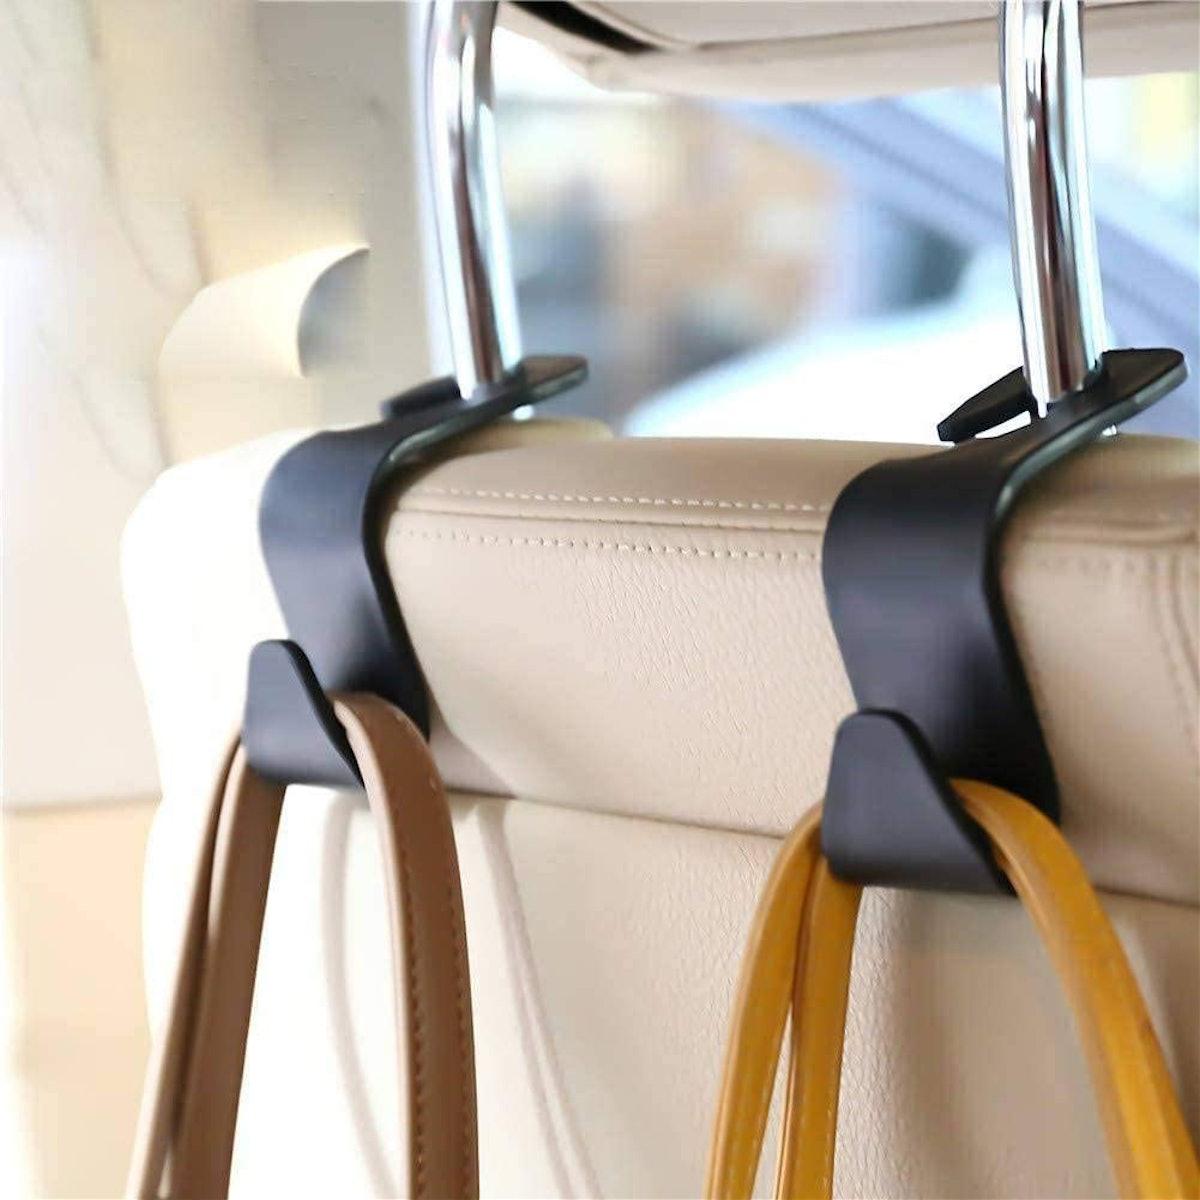 FJCTER Car Vehicle Headrest Hooks (4-Pack)